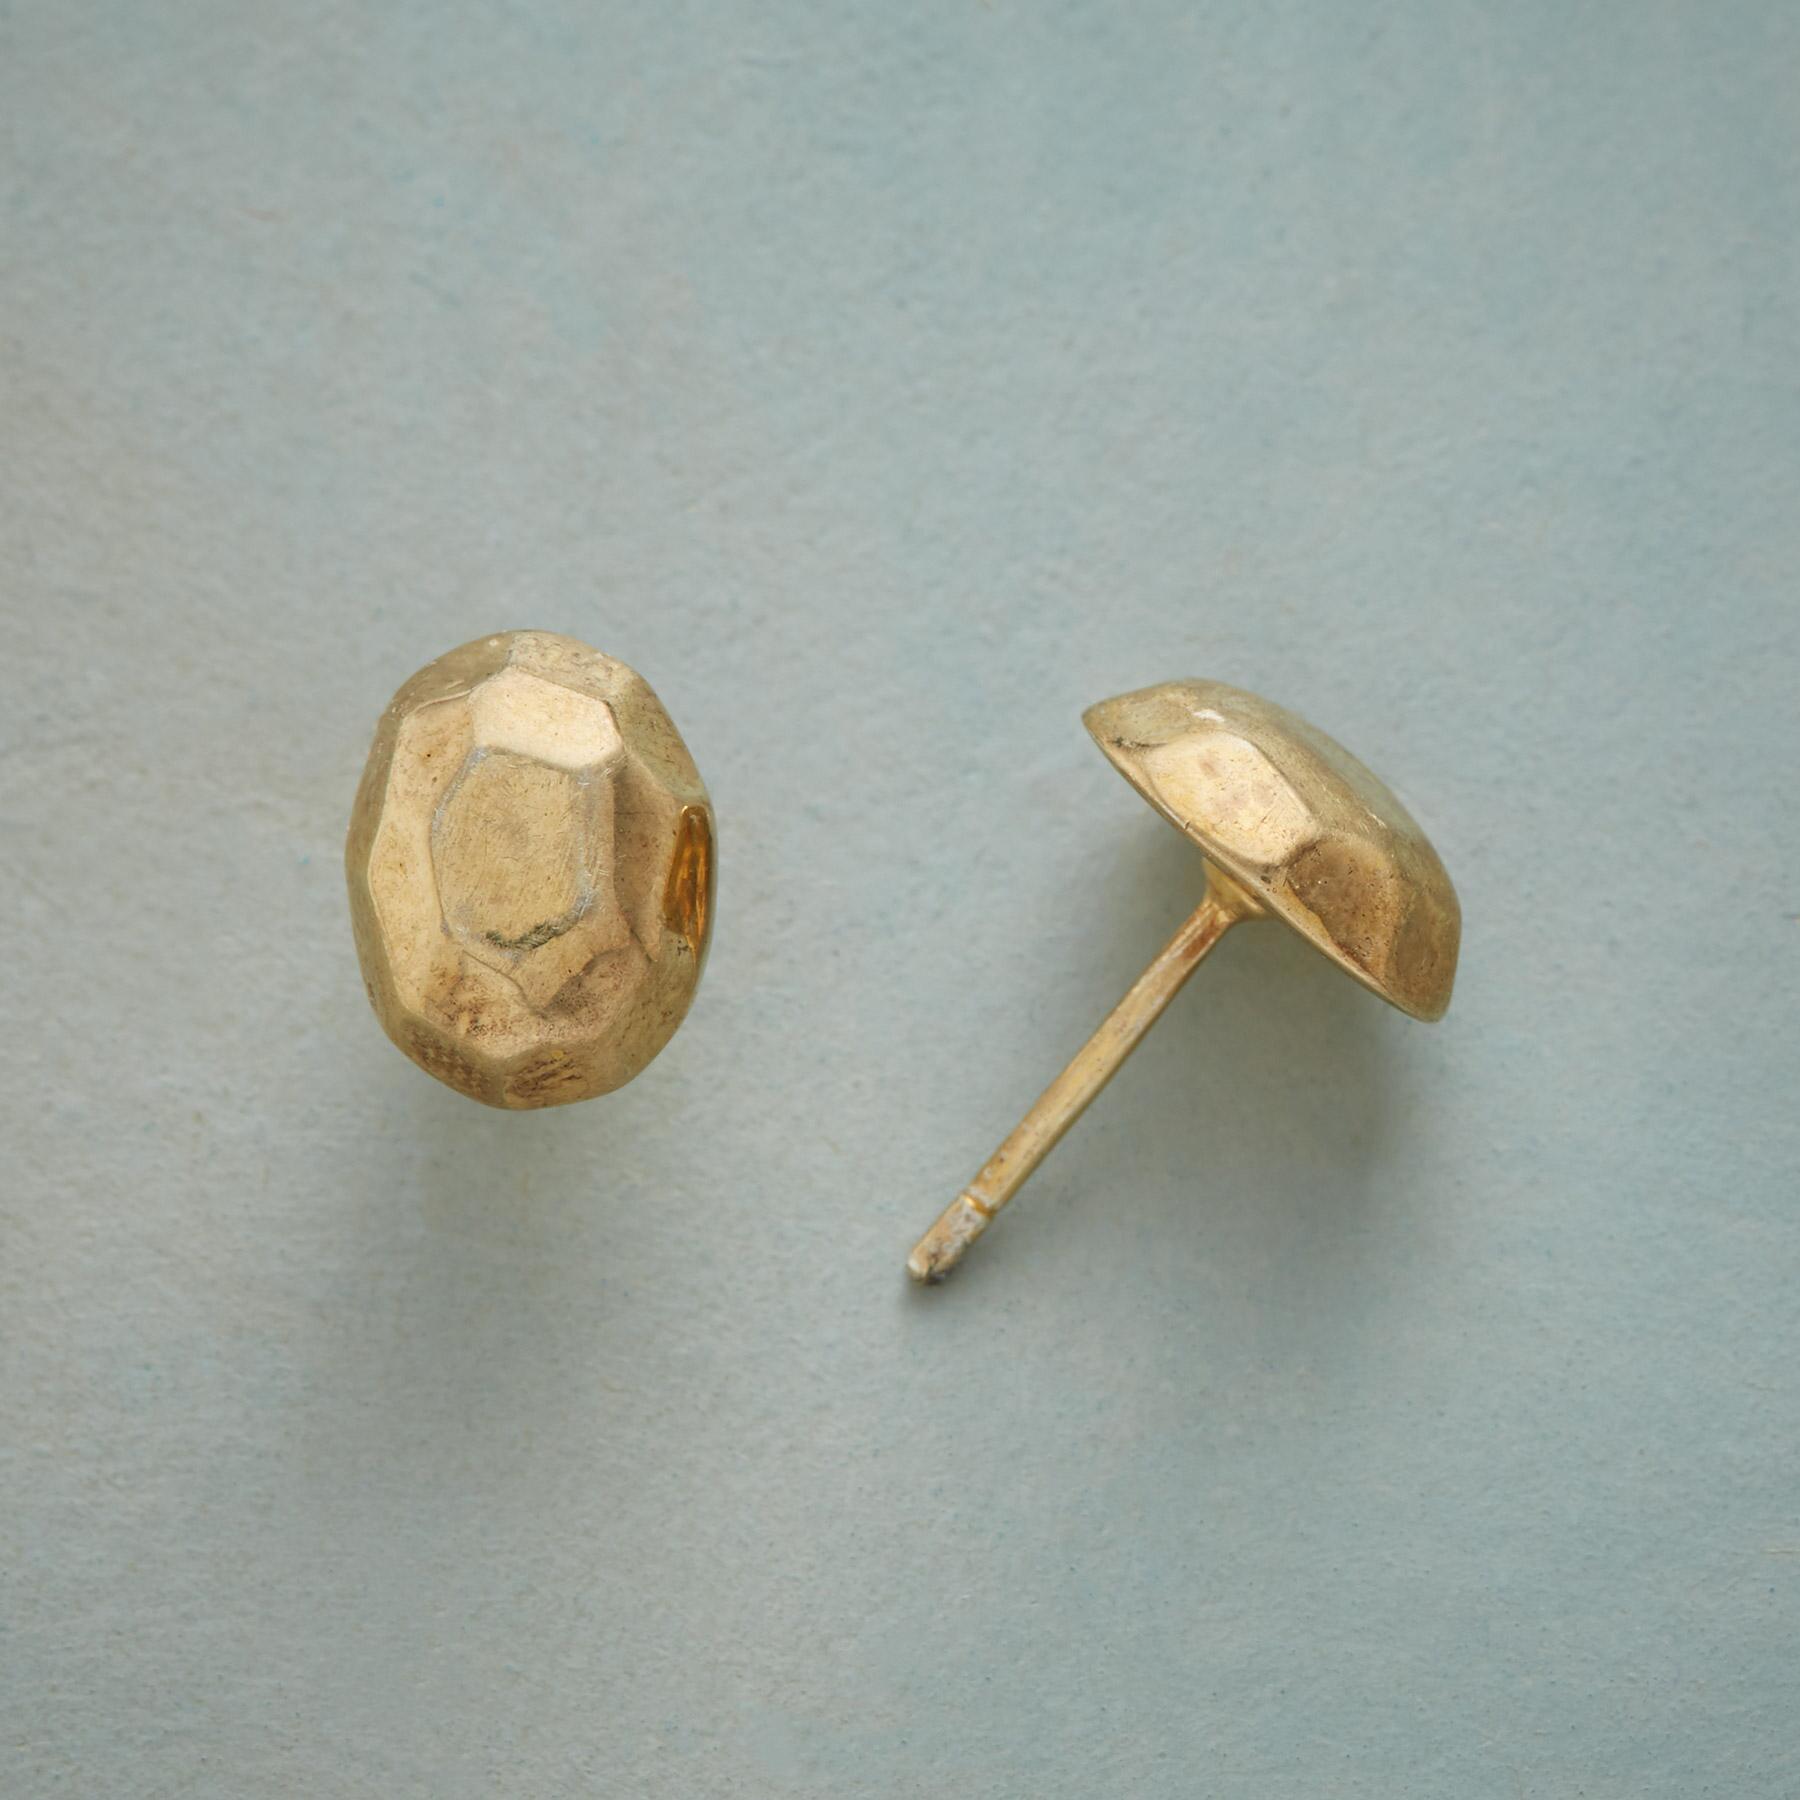 09d93c56d Faceted Dome Earrings | Robert Redford's Sundance Catalog